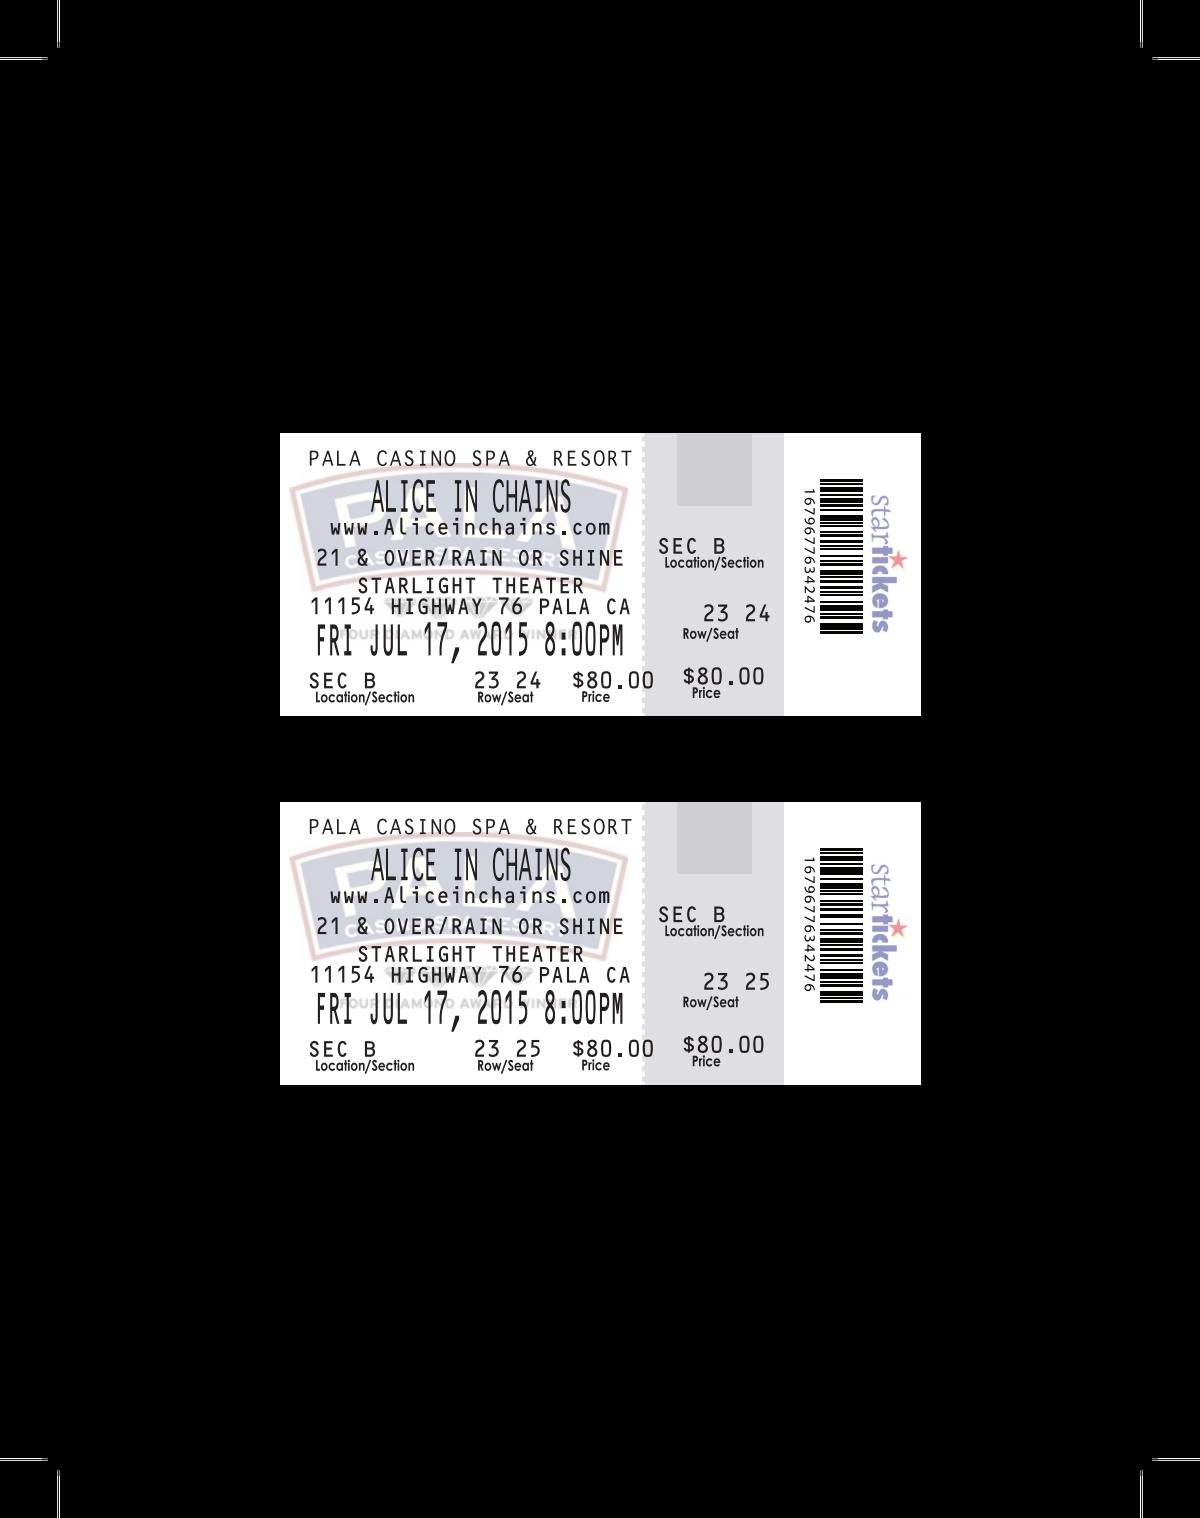 Concert Ticket Replicas